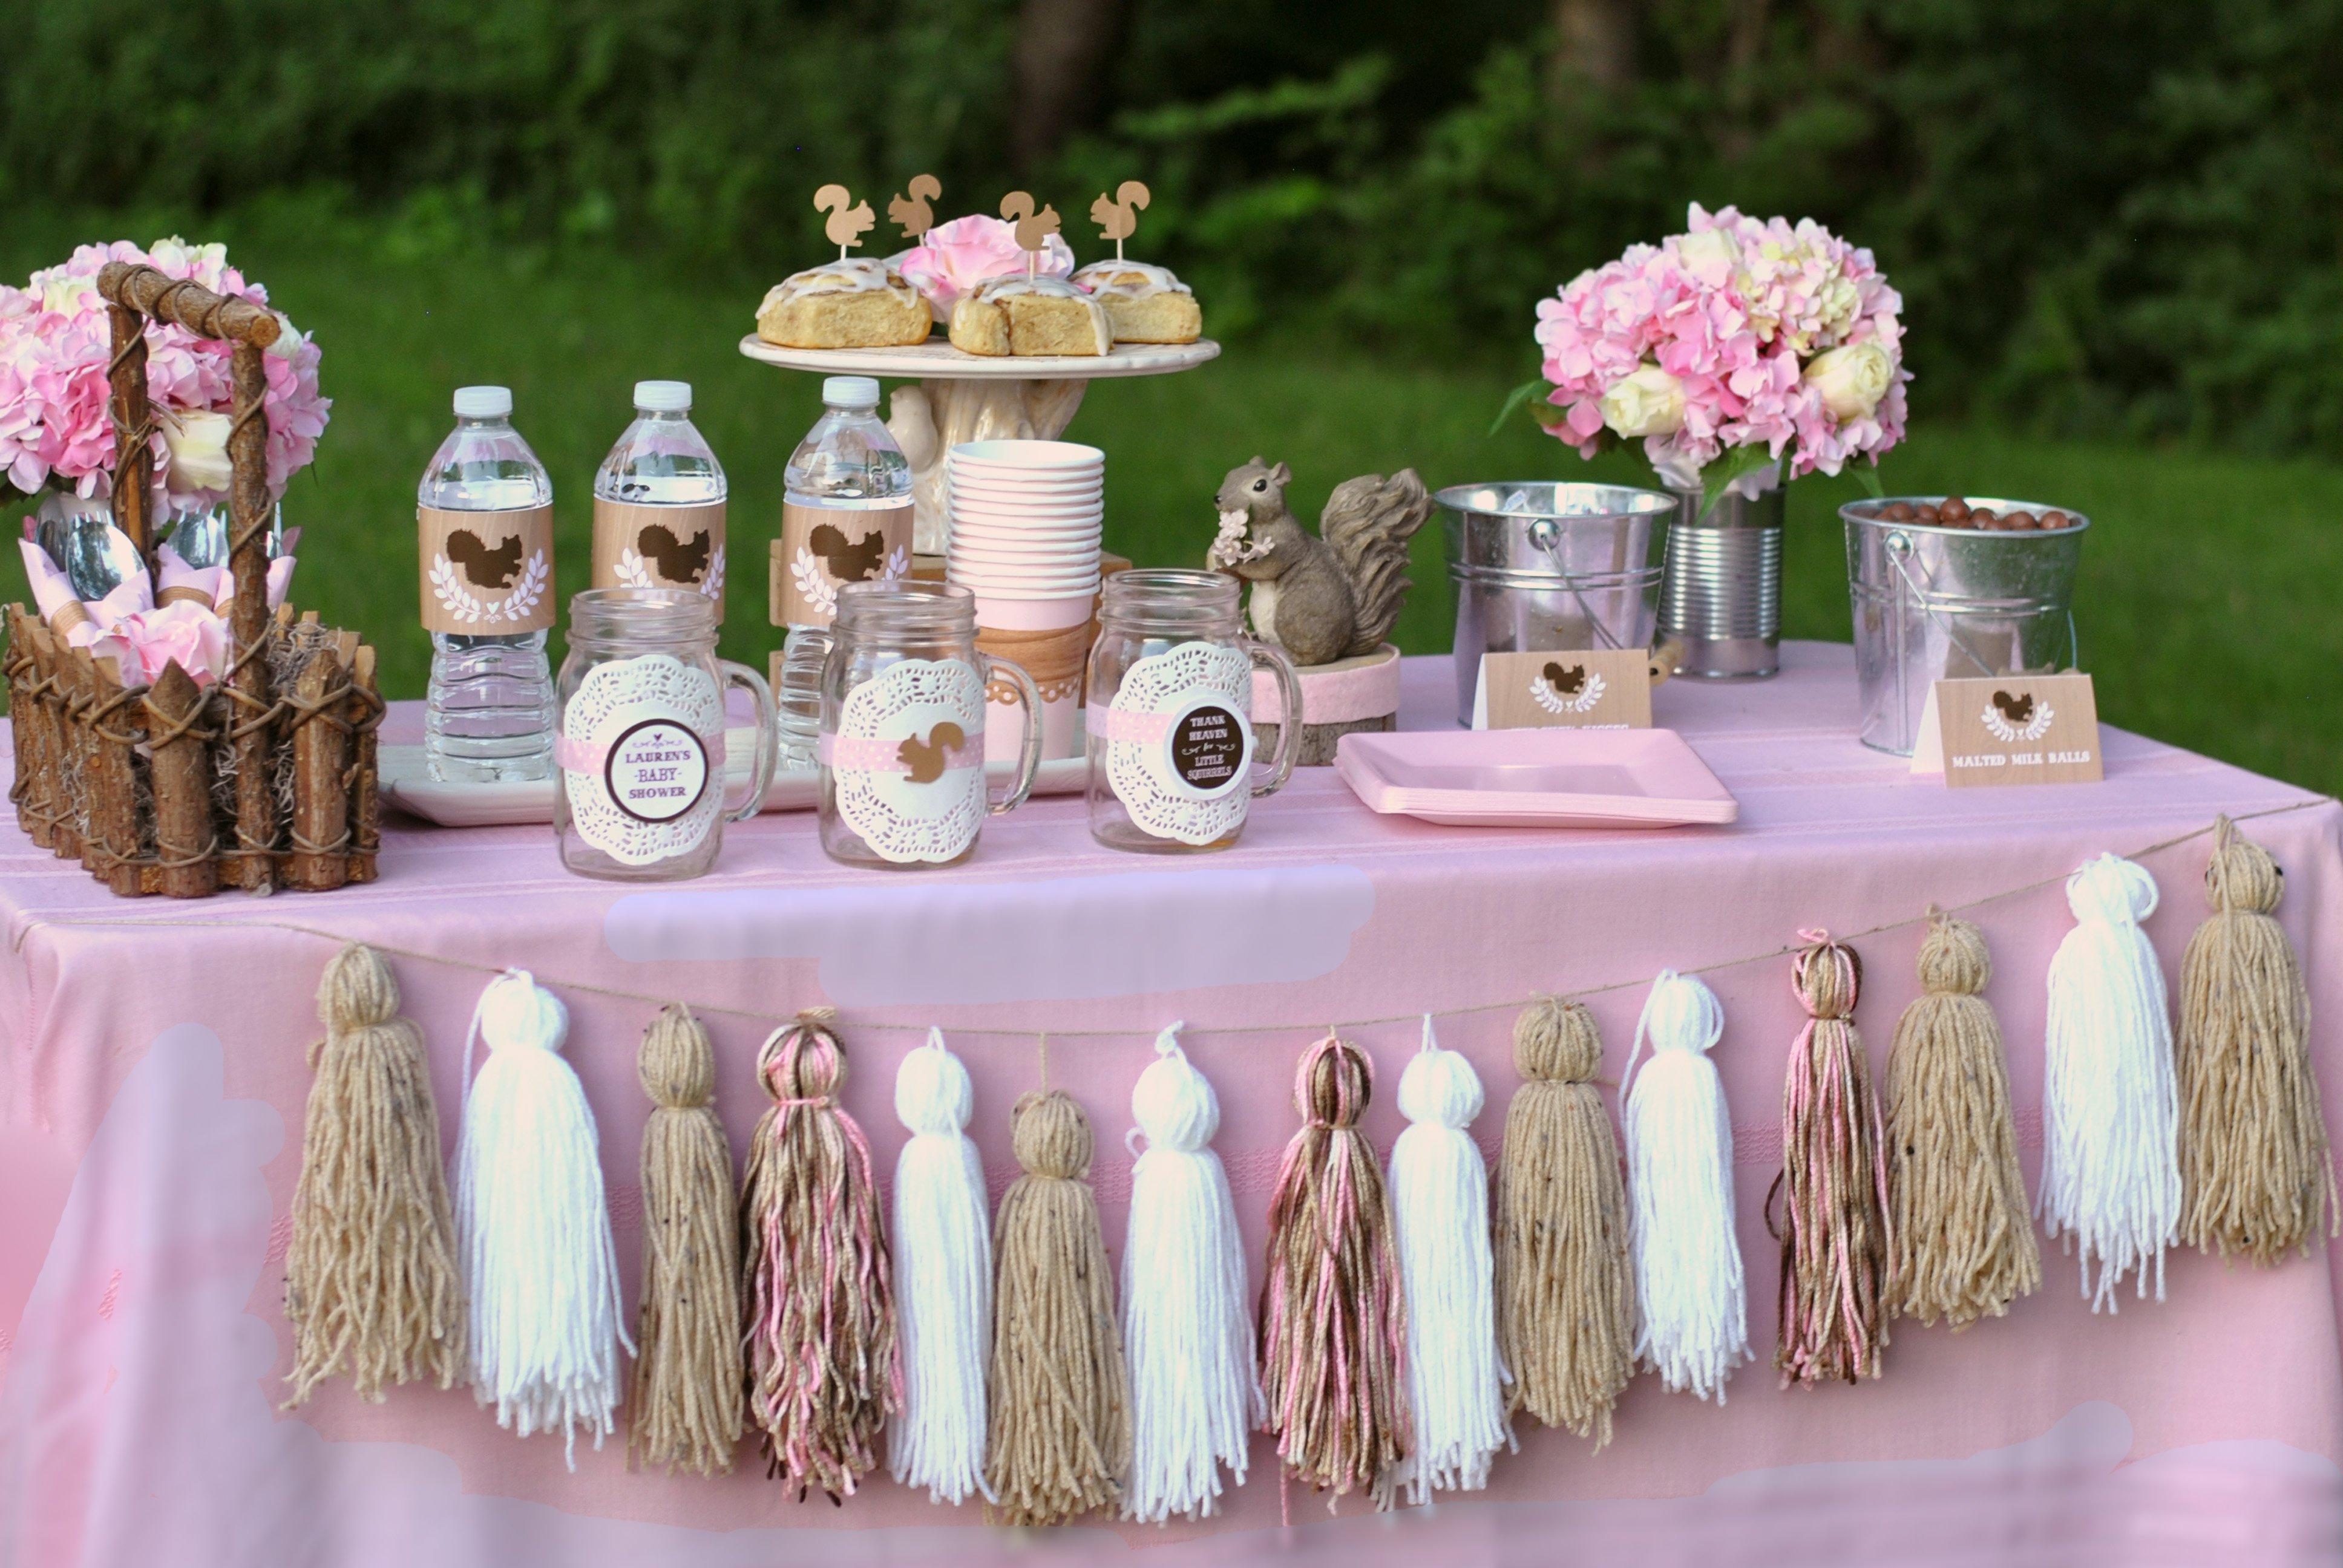 10 Ideal Baby Shower Ideas On Pinterest theme ideas for girl baby shower omega center ideas for baby 3